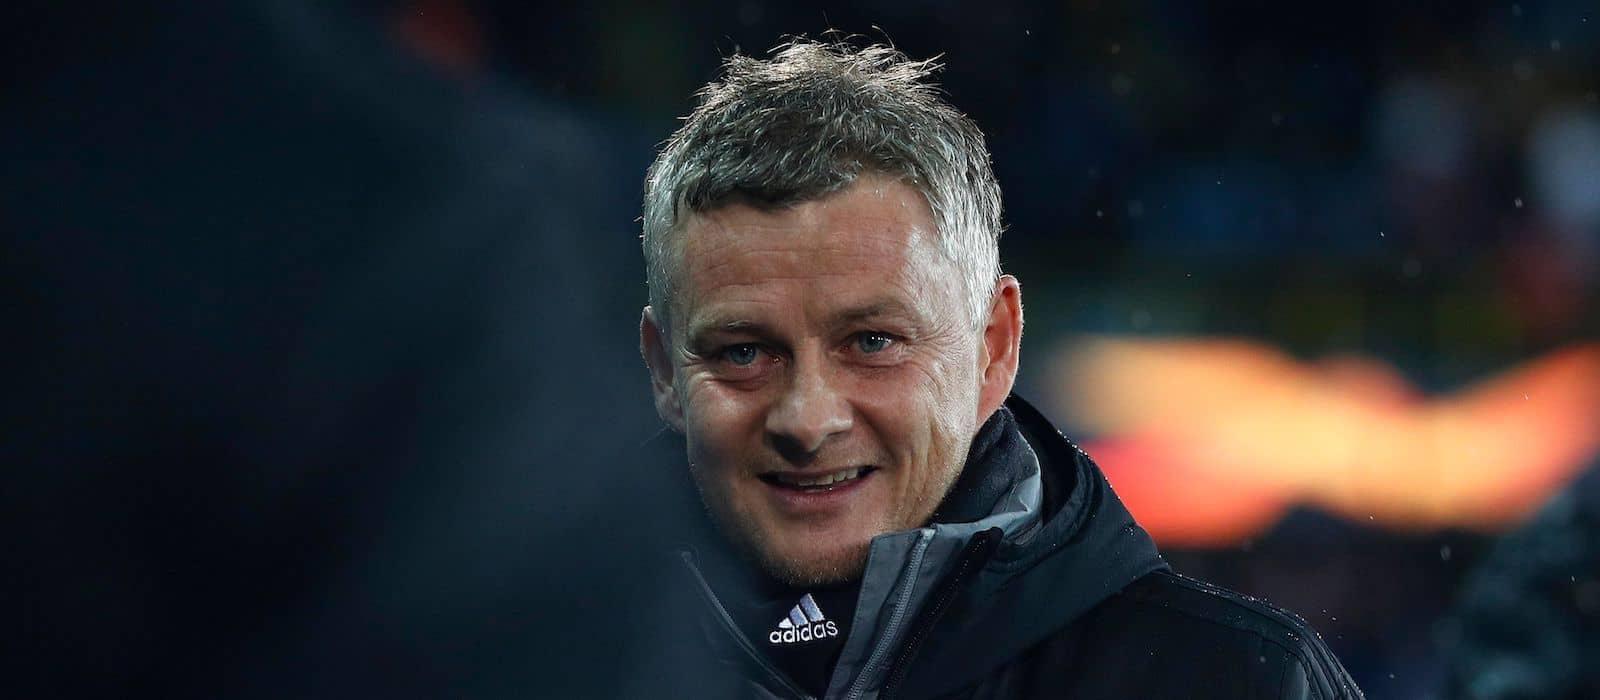 Ole Gunnar Solskjaer's tactical blunders will cost Man United dear